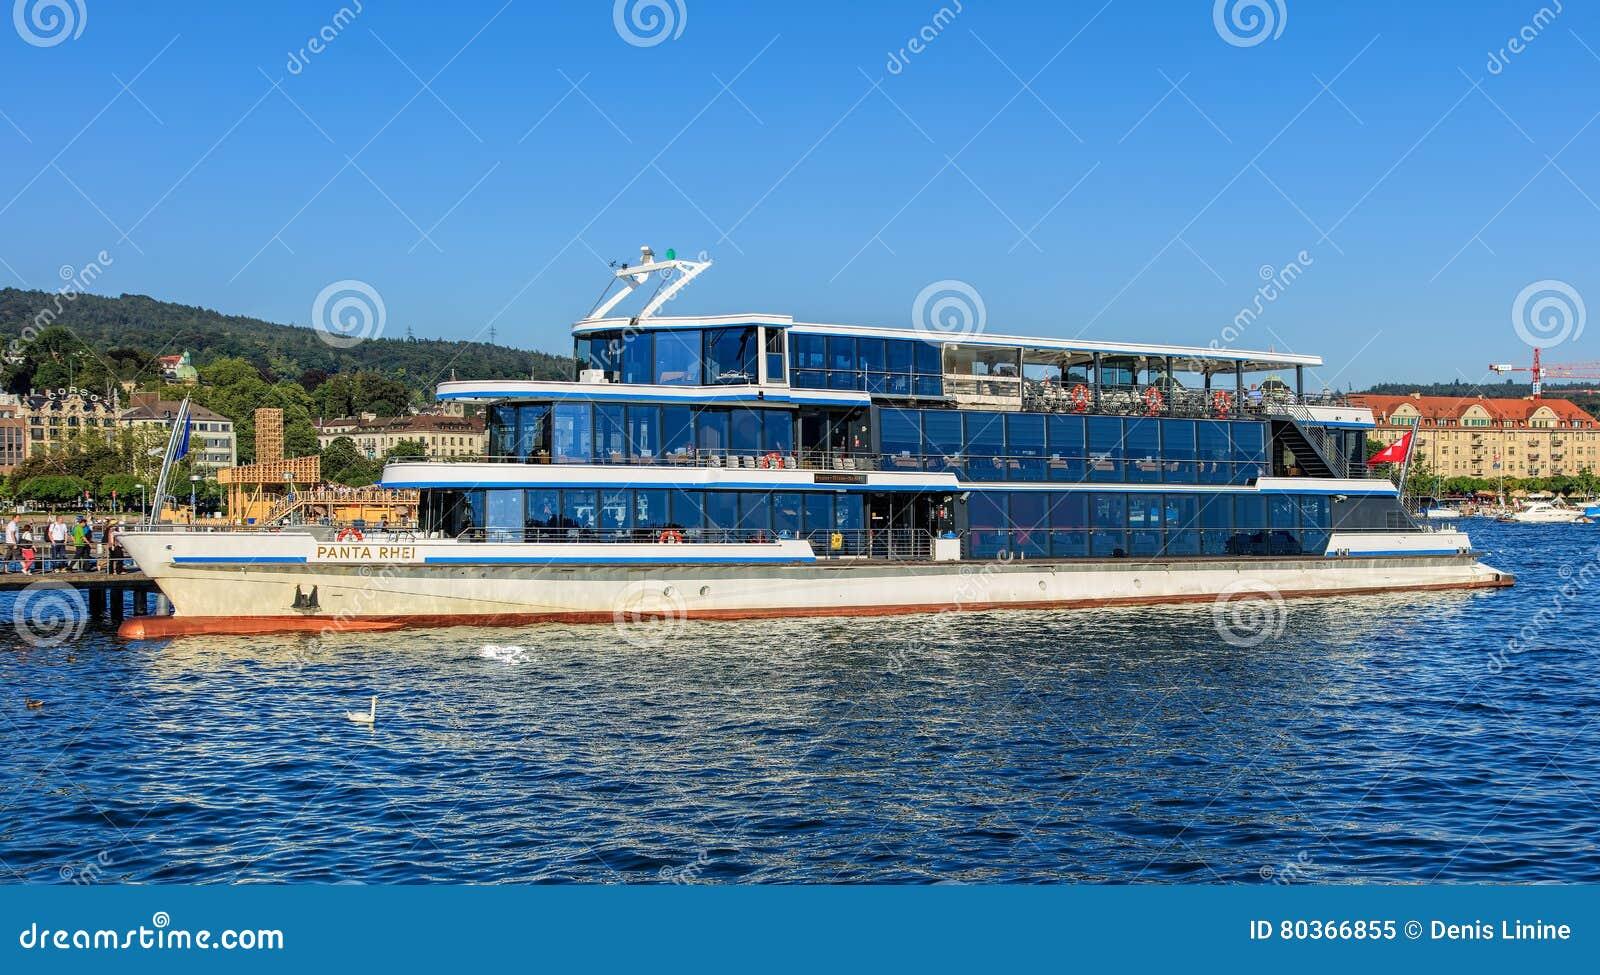 bateau zurich